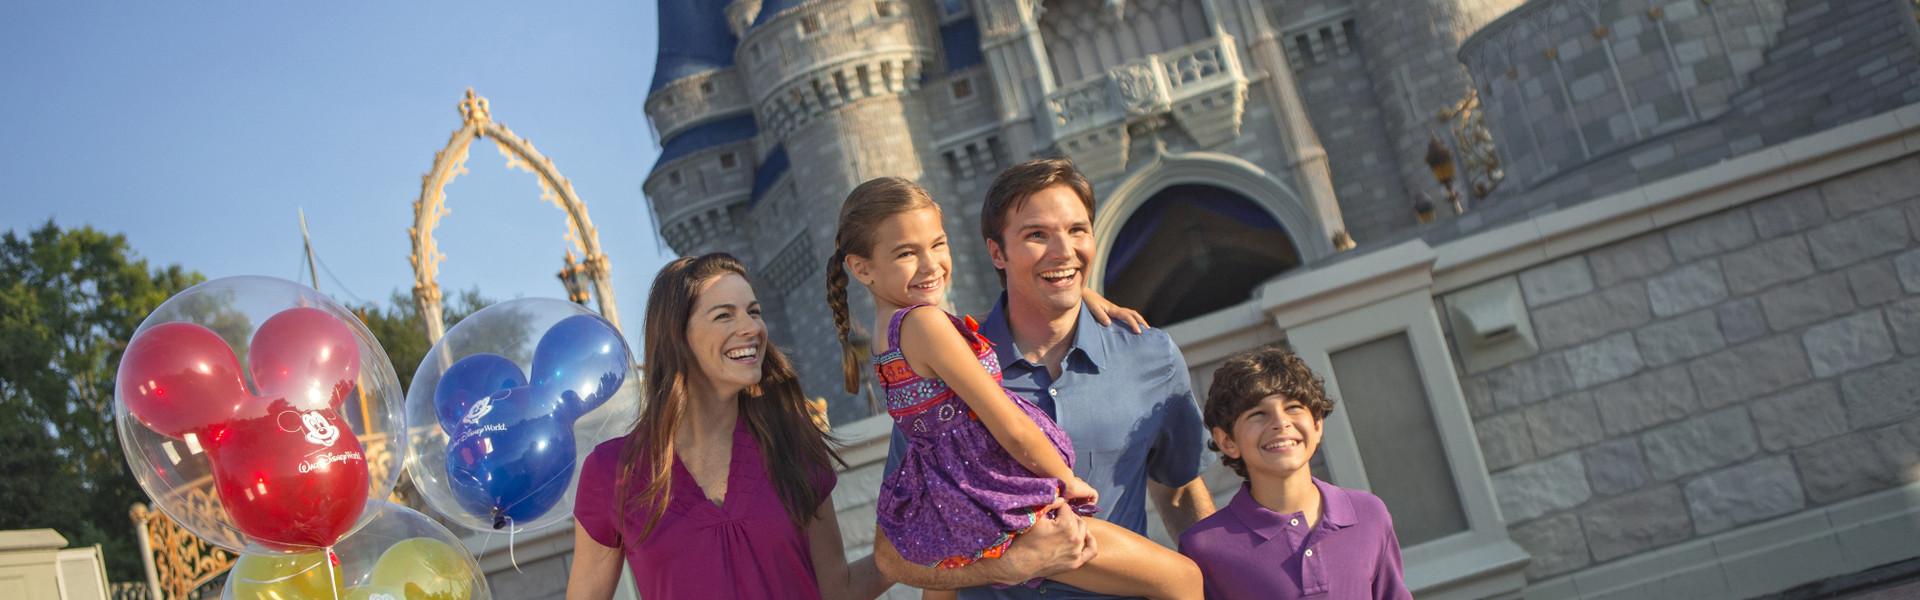 Enjoying Florida Attractions Discounts & Tickets | Orlando Florida Attractions For Adults & Kids Near Sea World in Orlando, FL 32836 | Westgate Blue Tree Resort